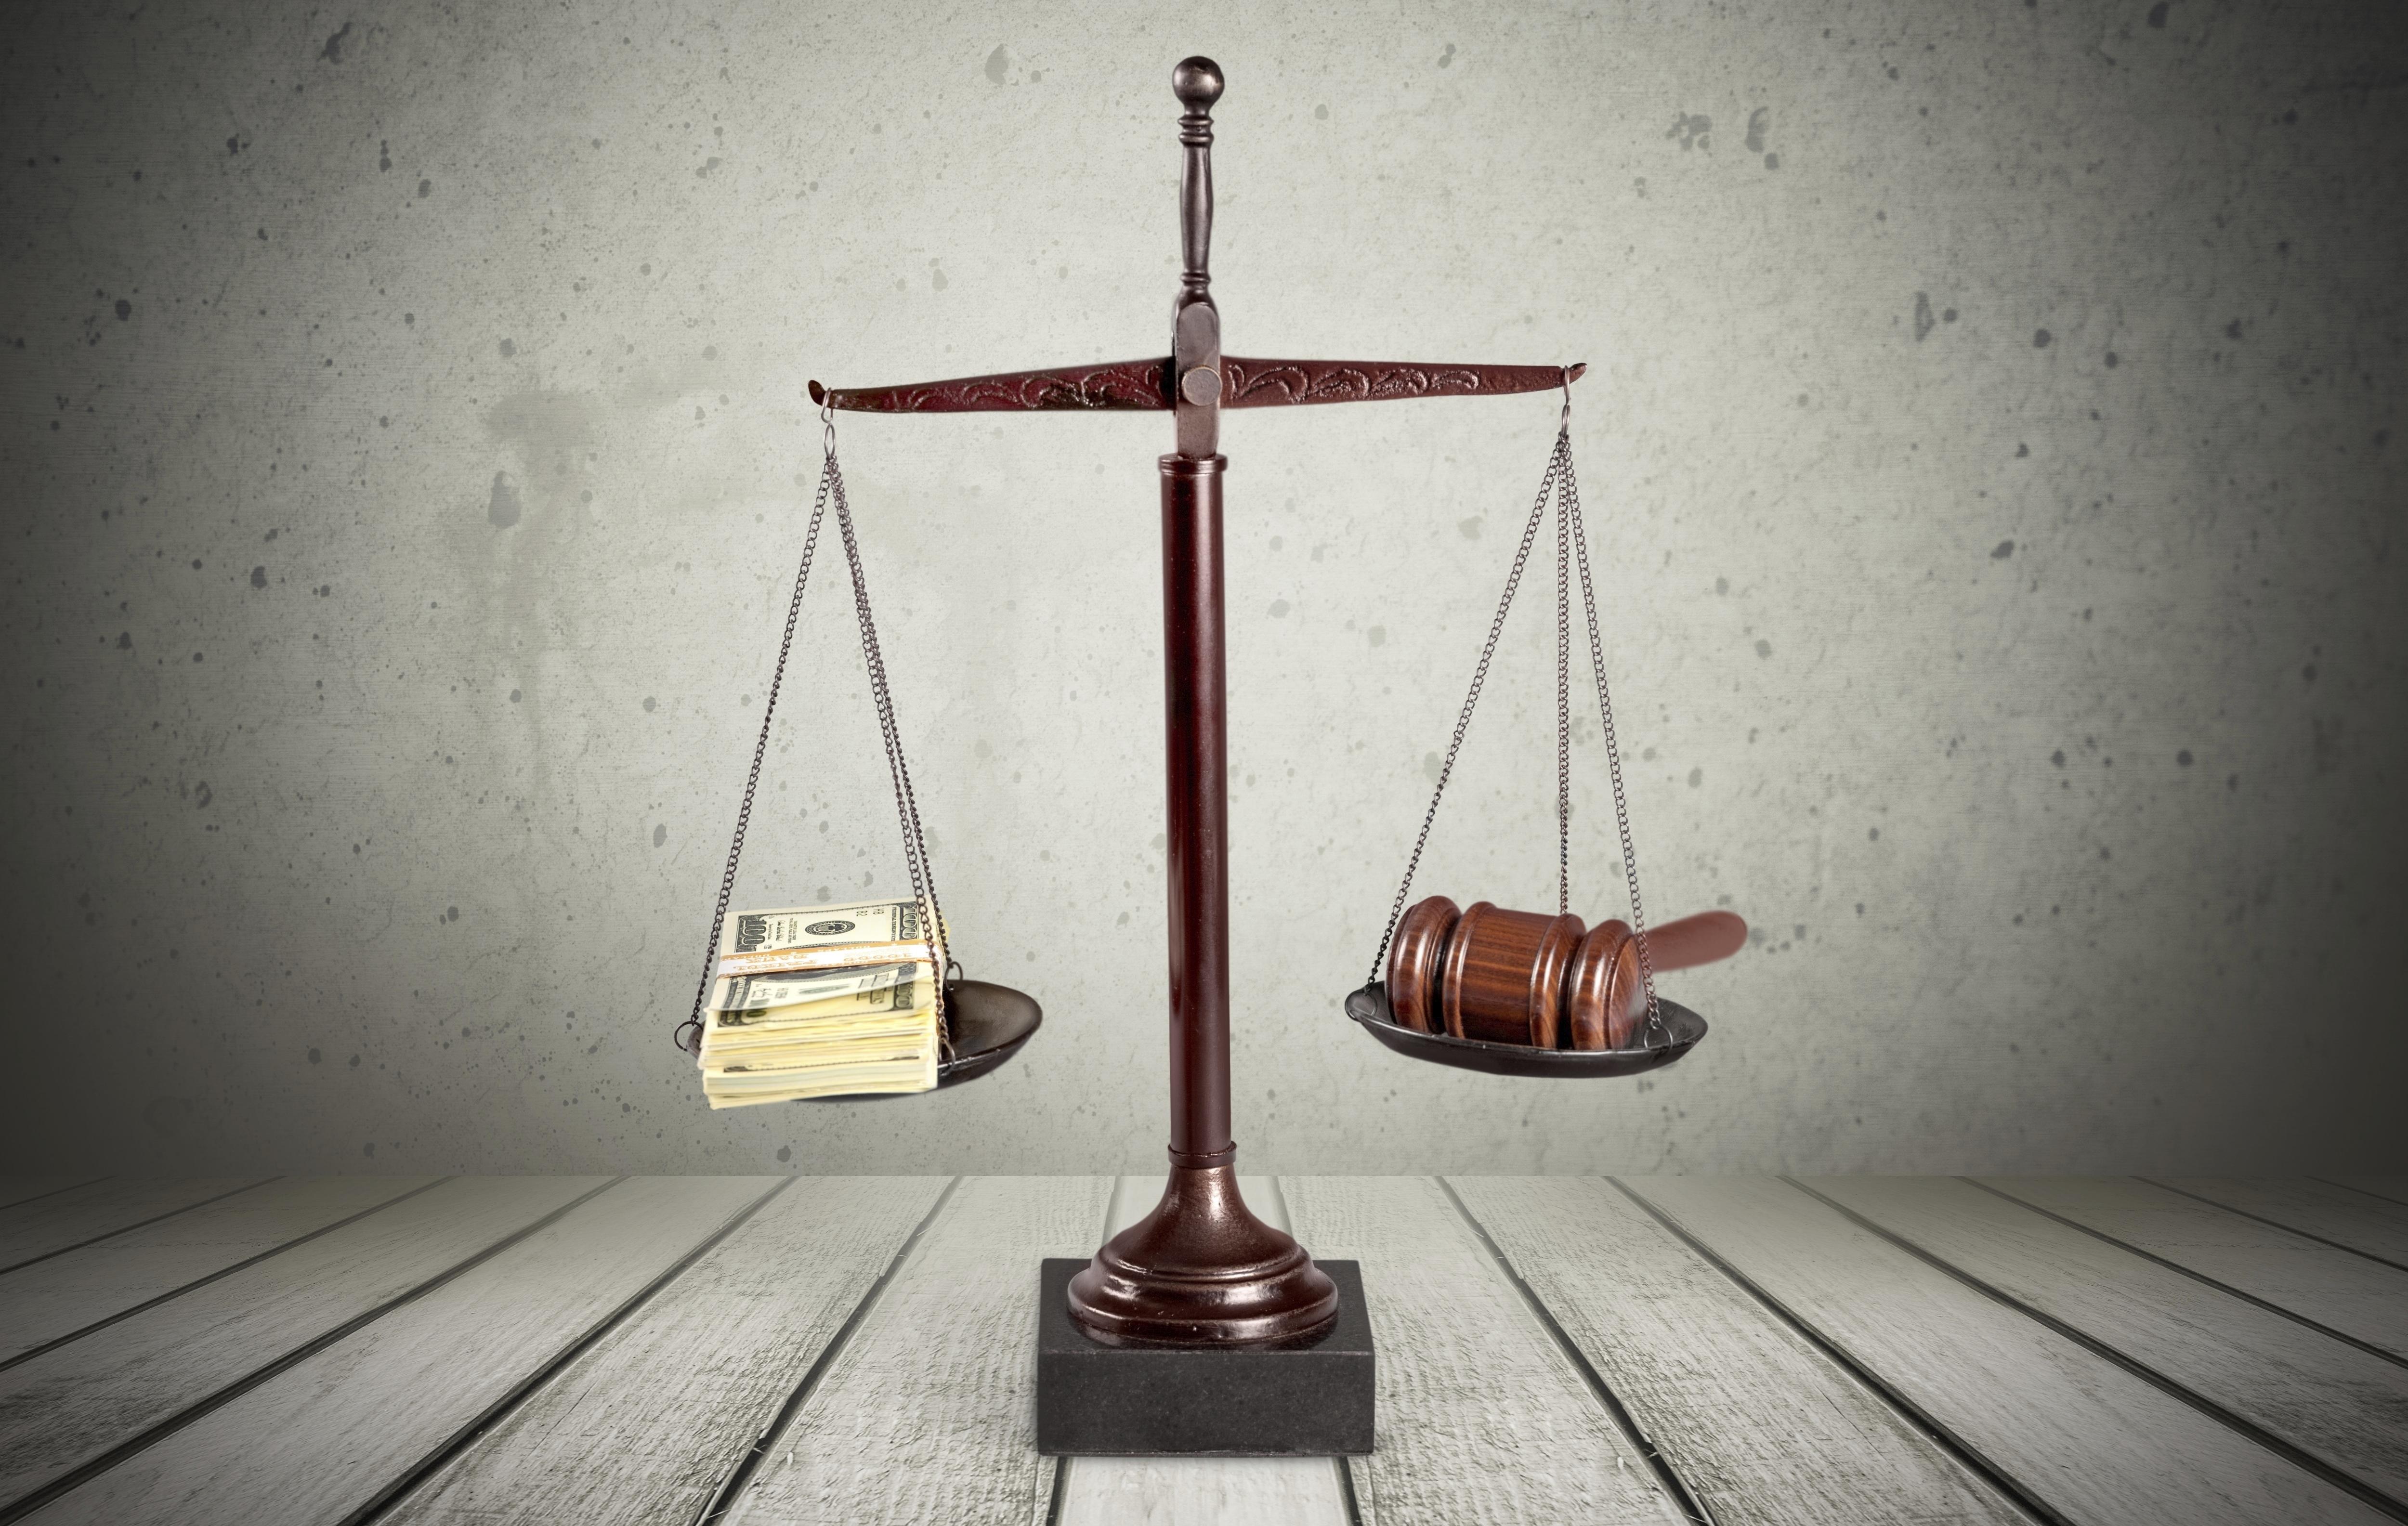 Wright Medical Artificial Hip Settlement: Wrong for Plaintiffs